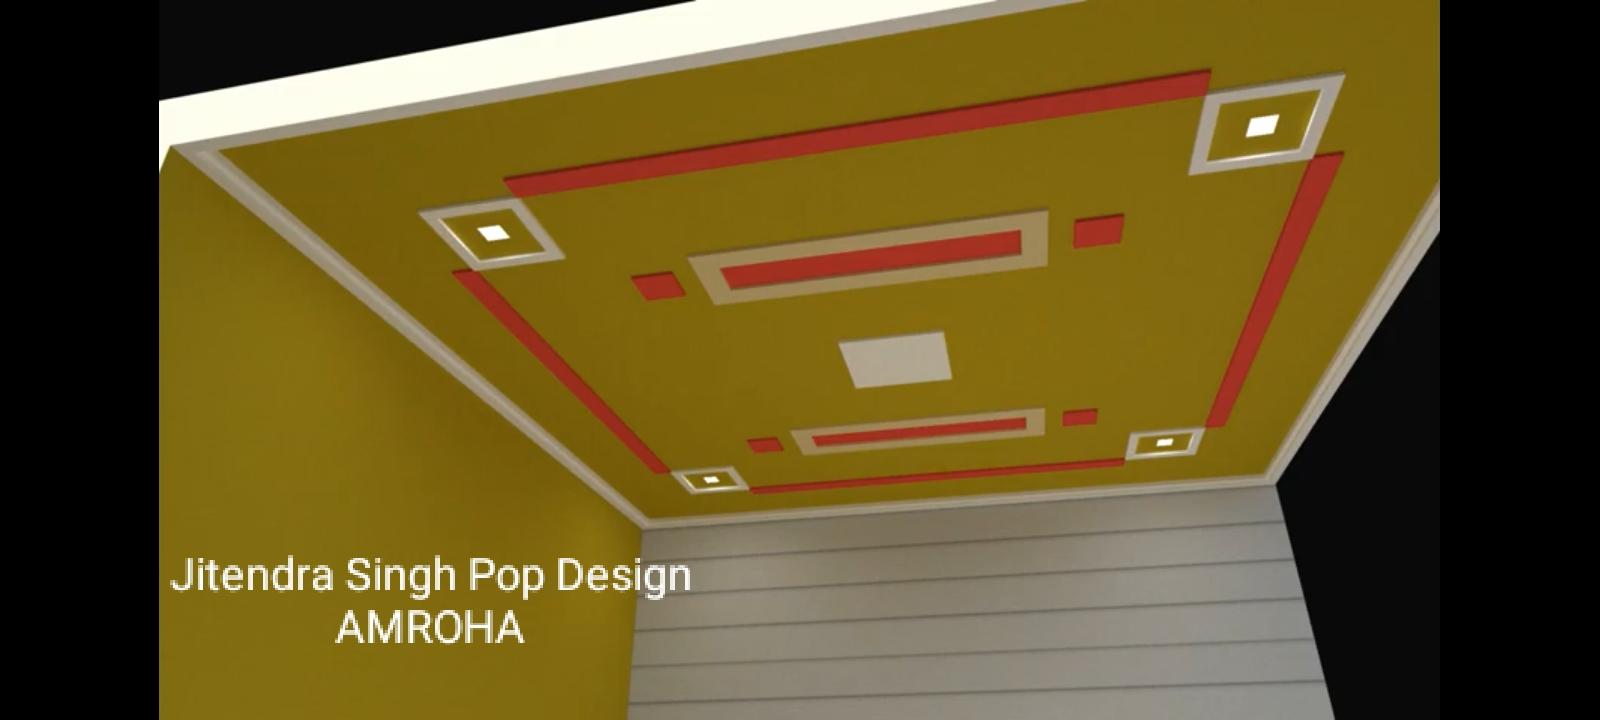 Plus Minus Pop Designs For Lobby Jitendra Singh Pop Design